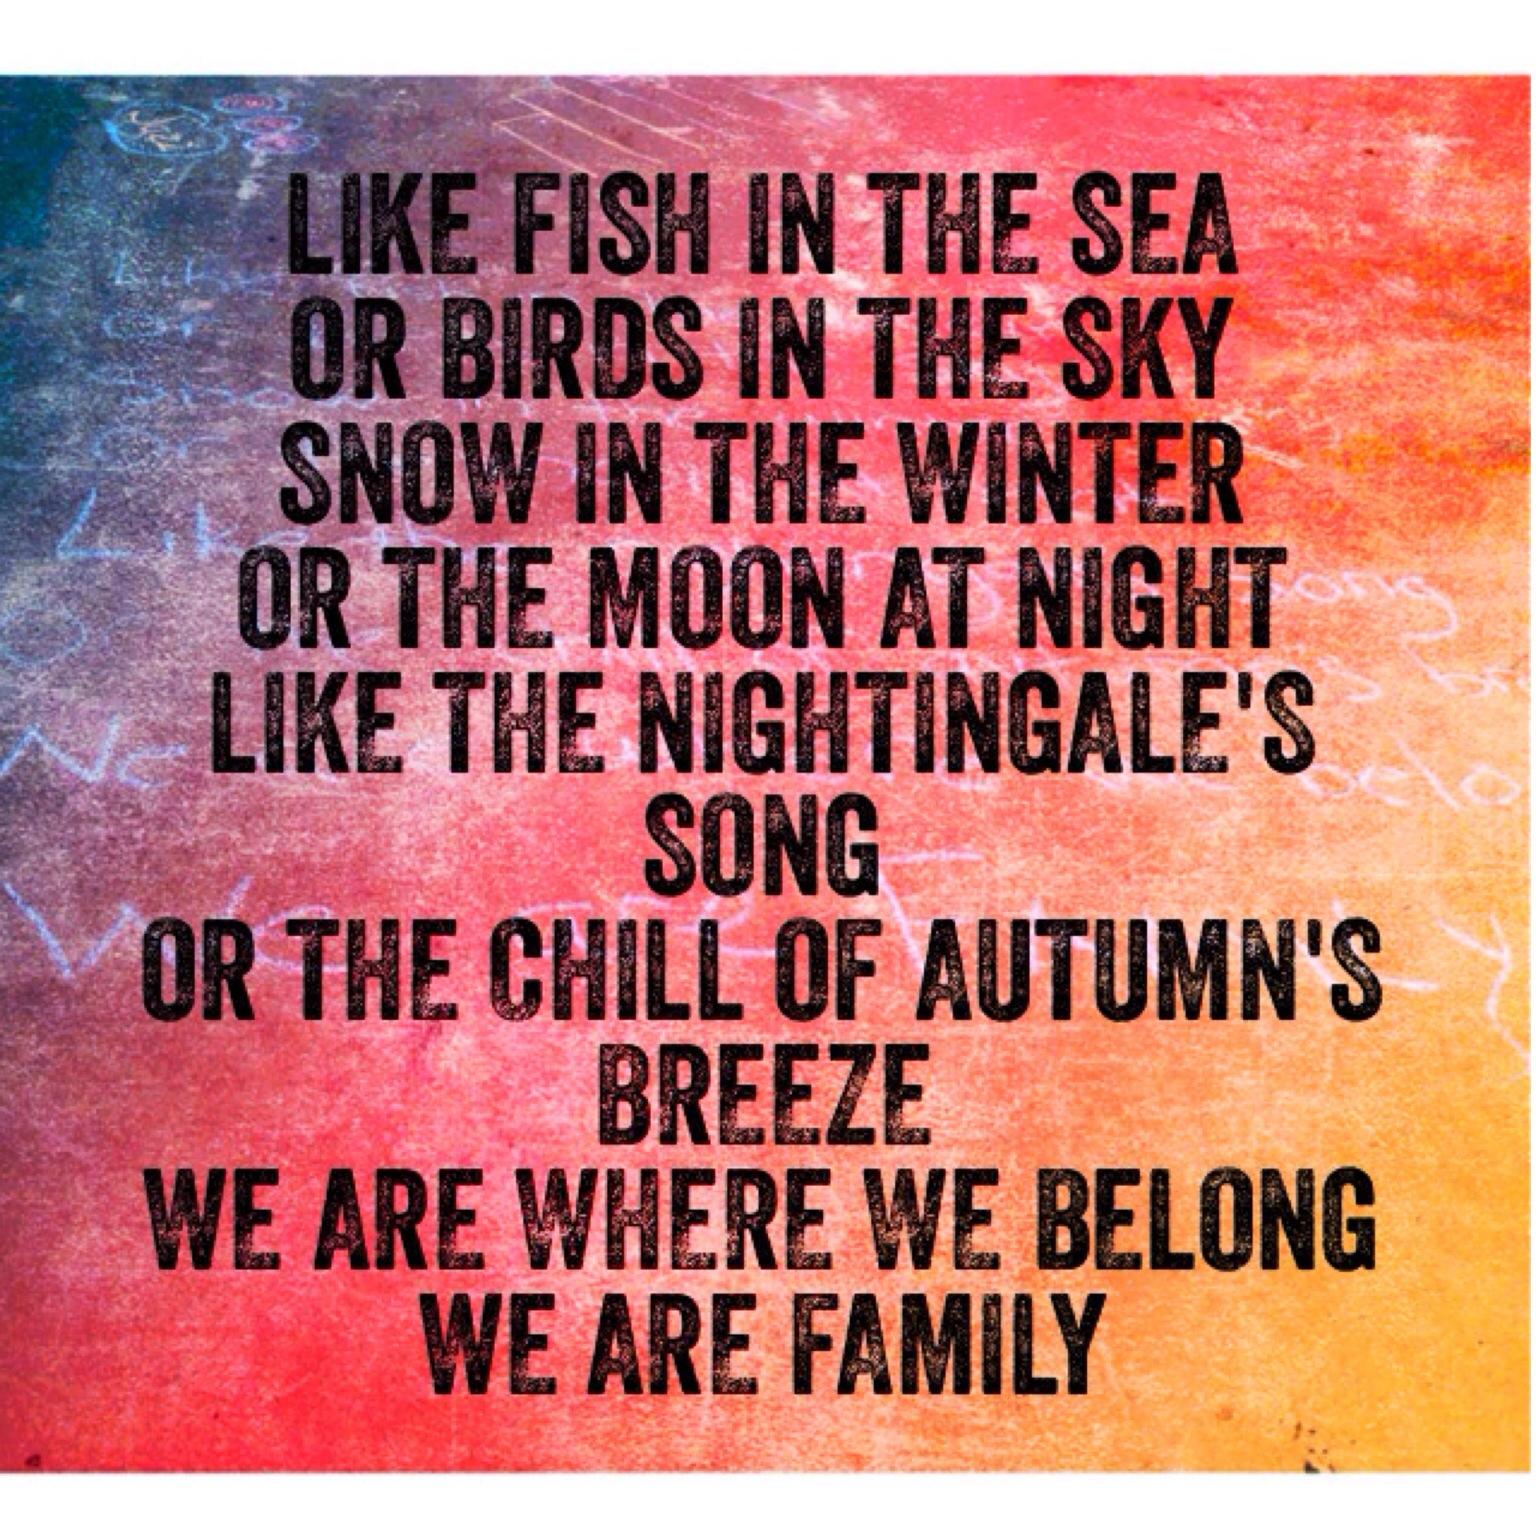 Belonging - Poem by Udaya R. Tennakoon